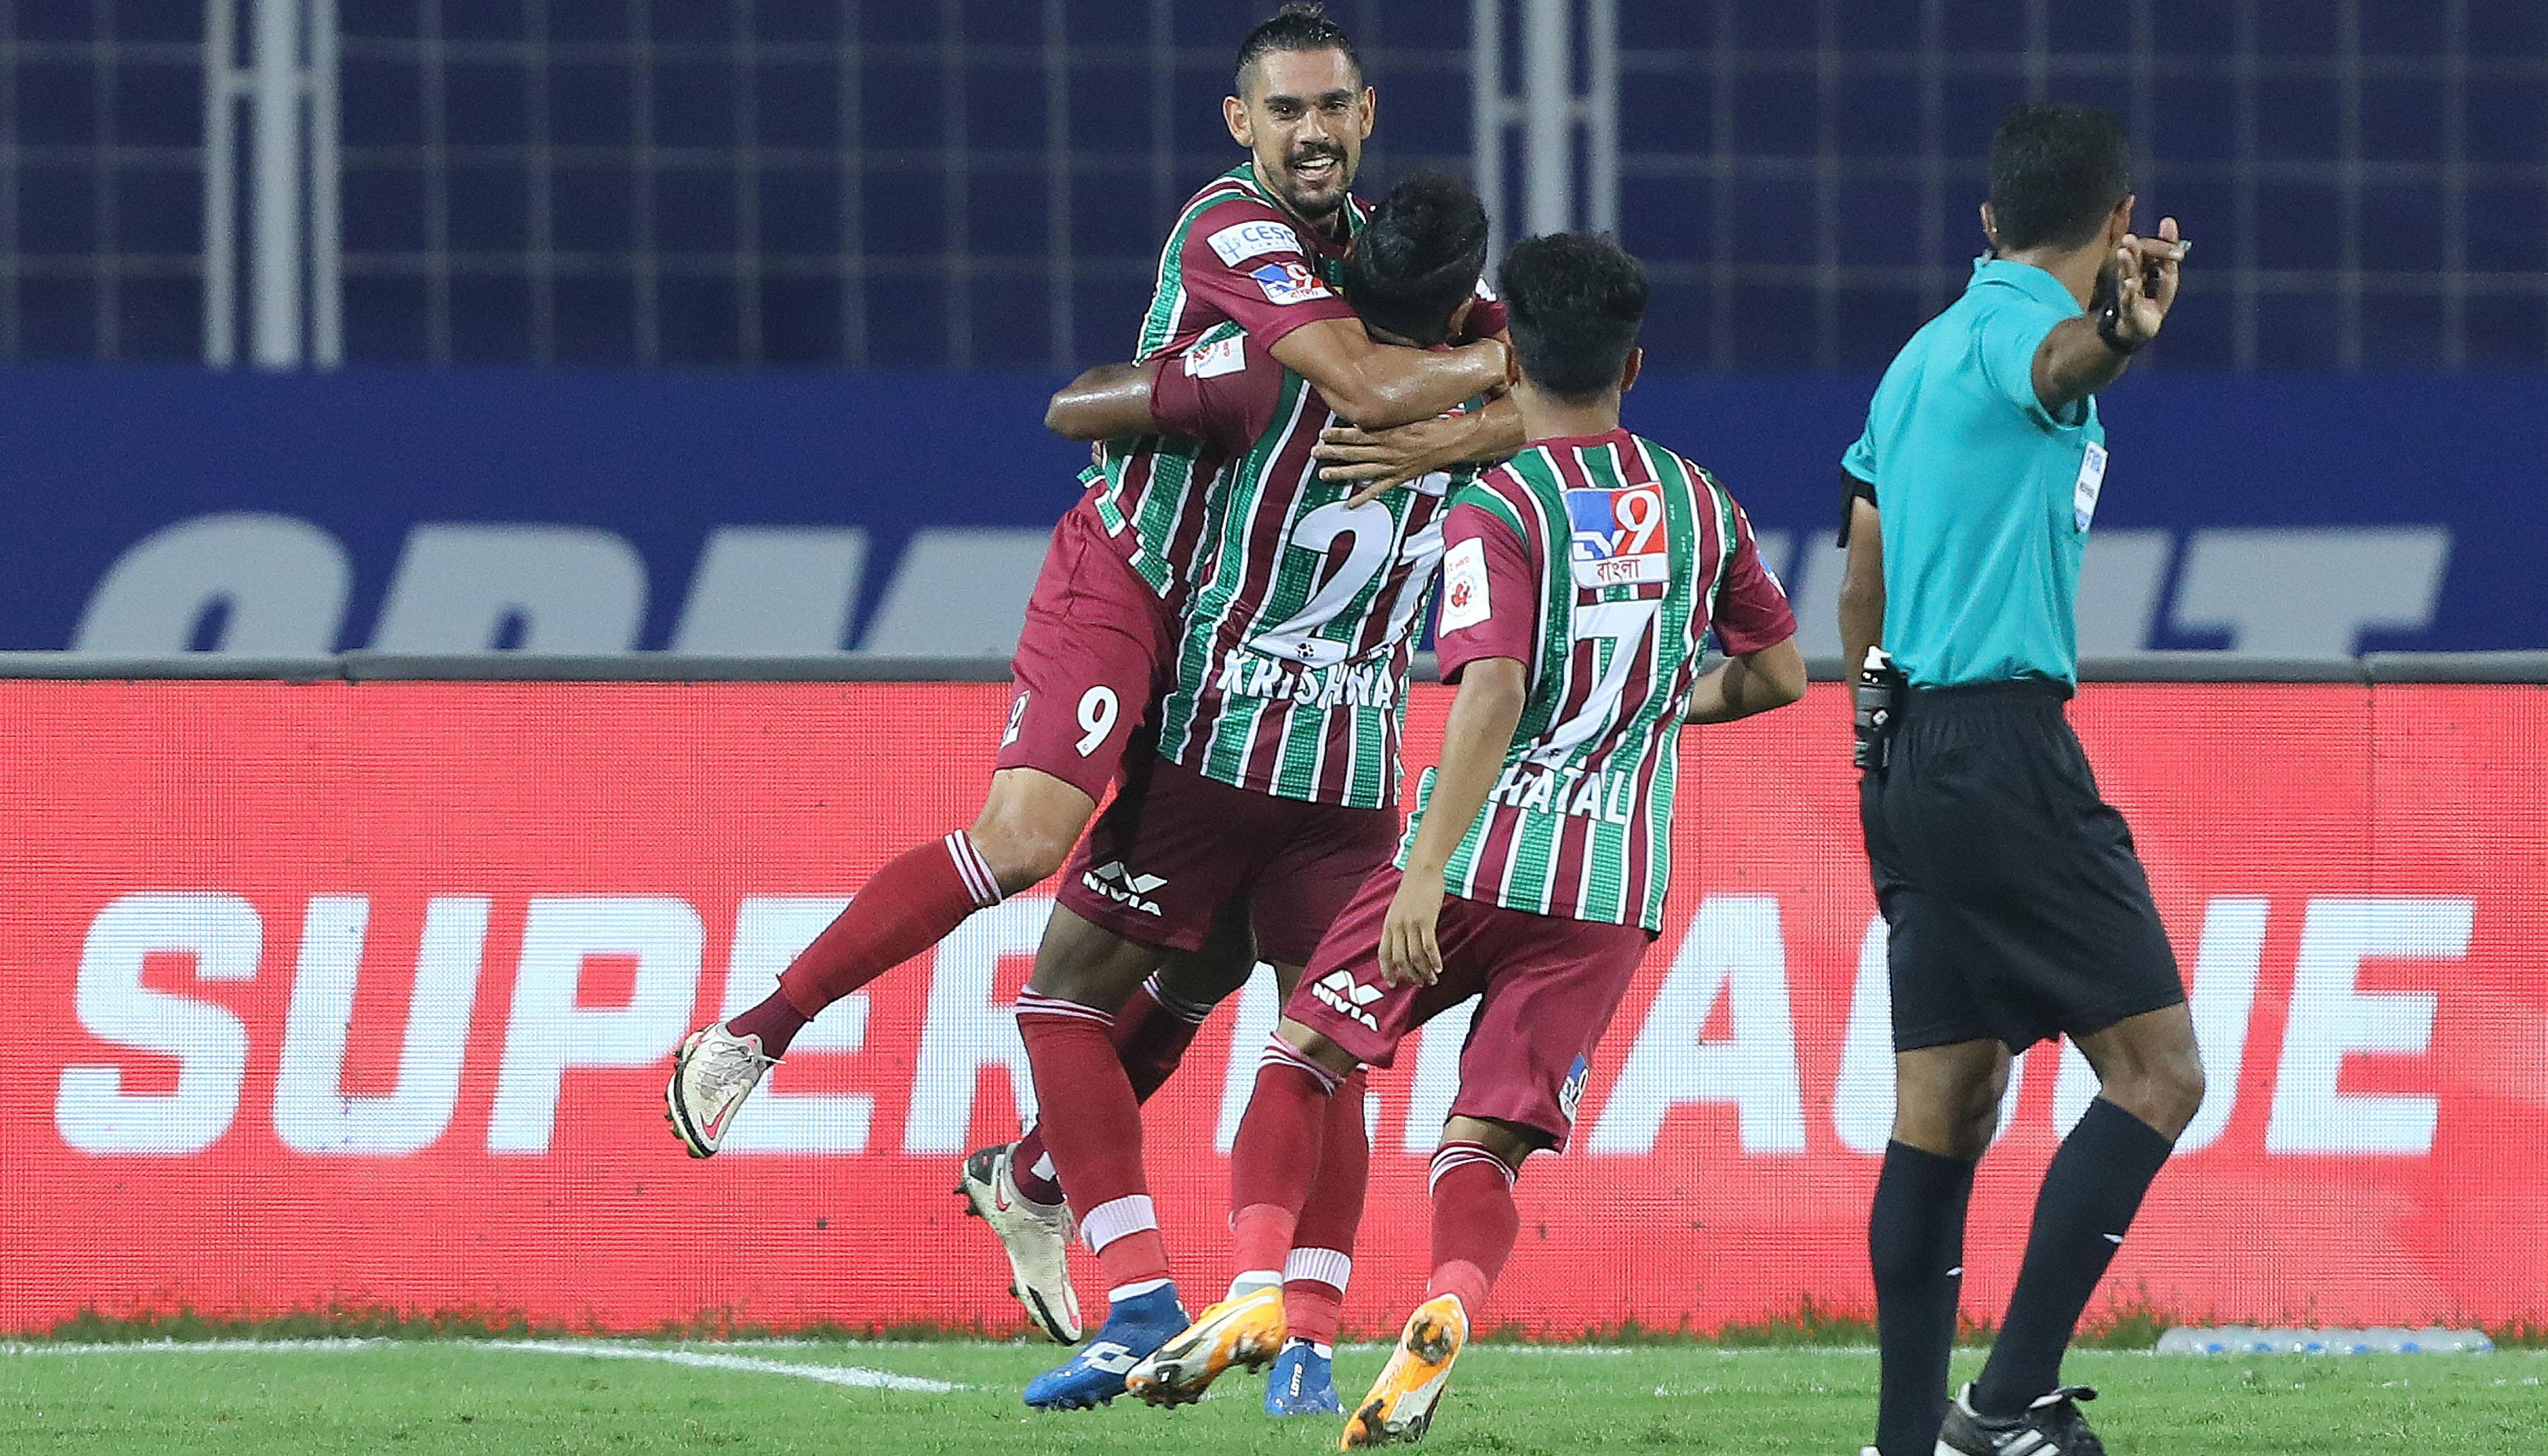 ISL 2020-21: Chennaiyin FC কে হারিয়ে জয়ে ফিরল ATK Mohun Bagan